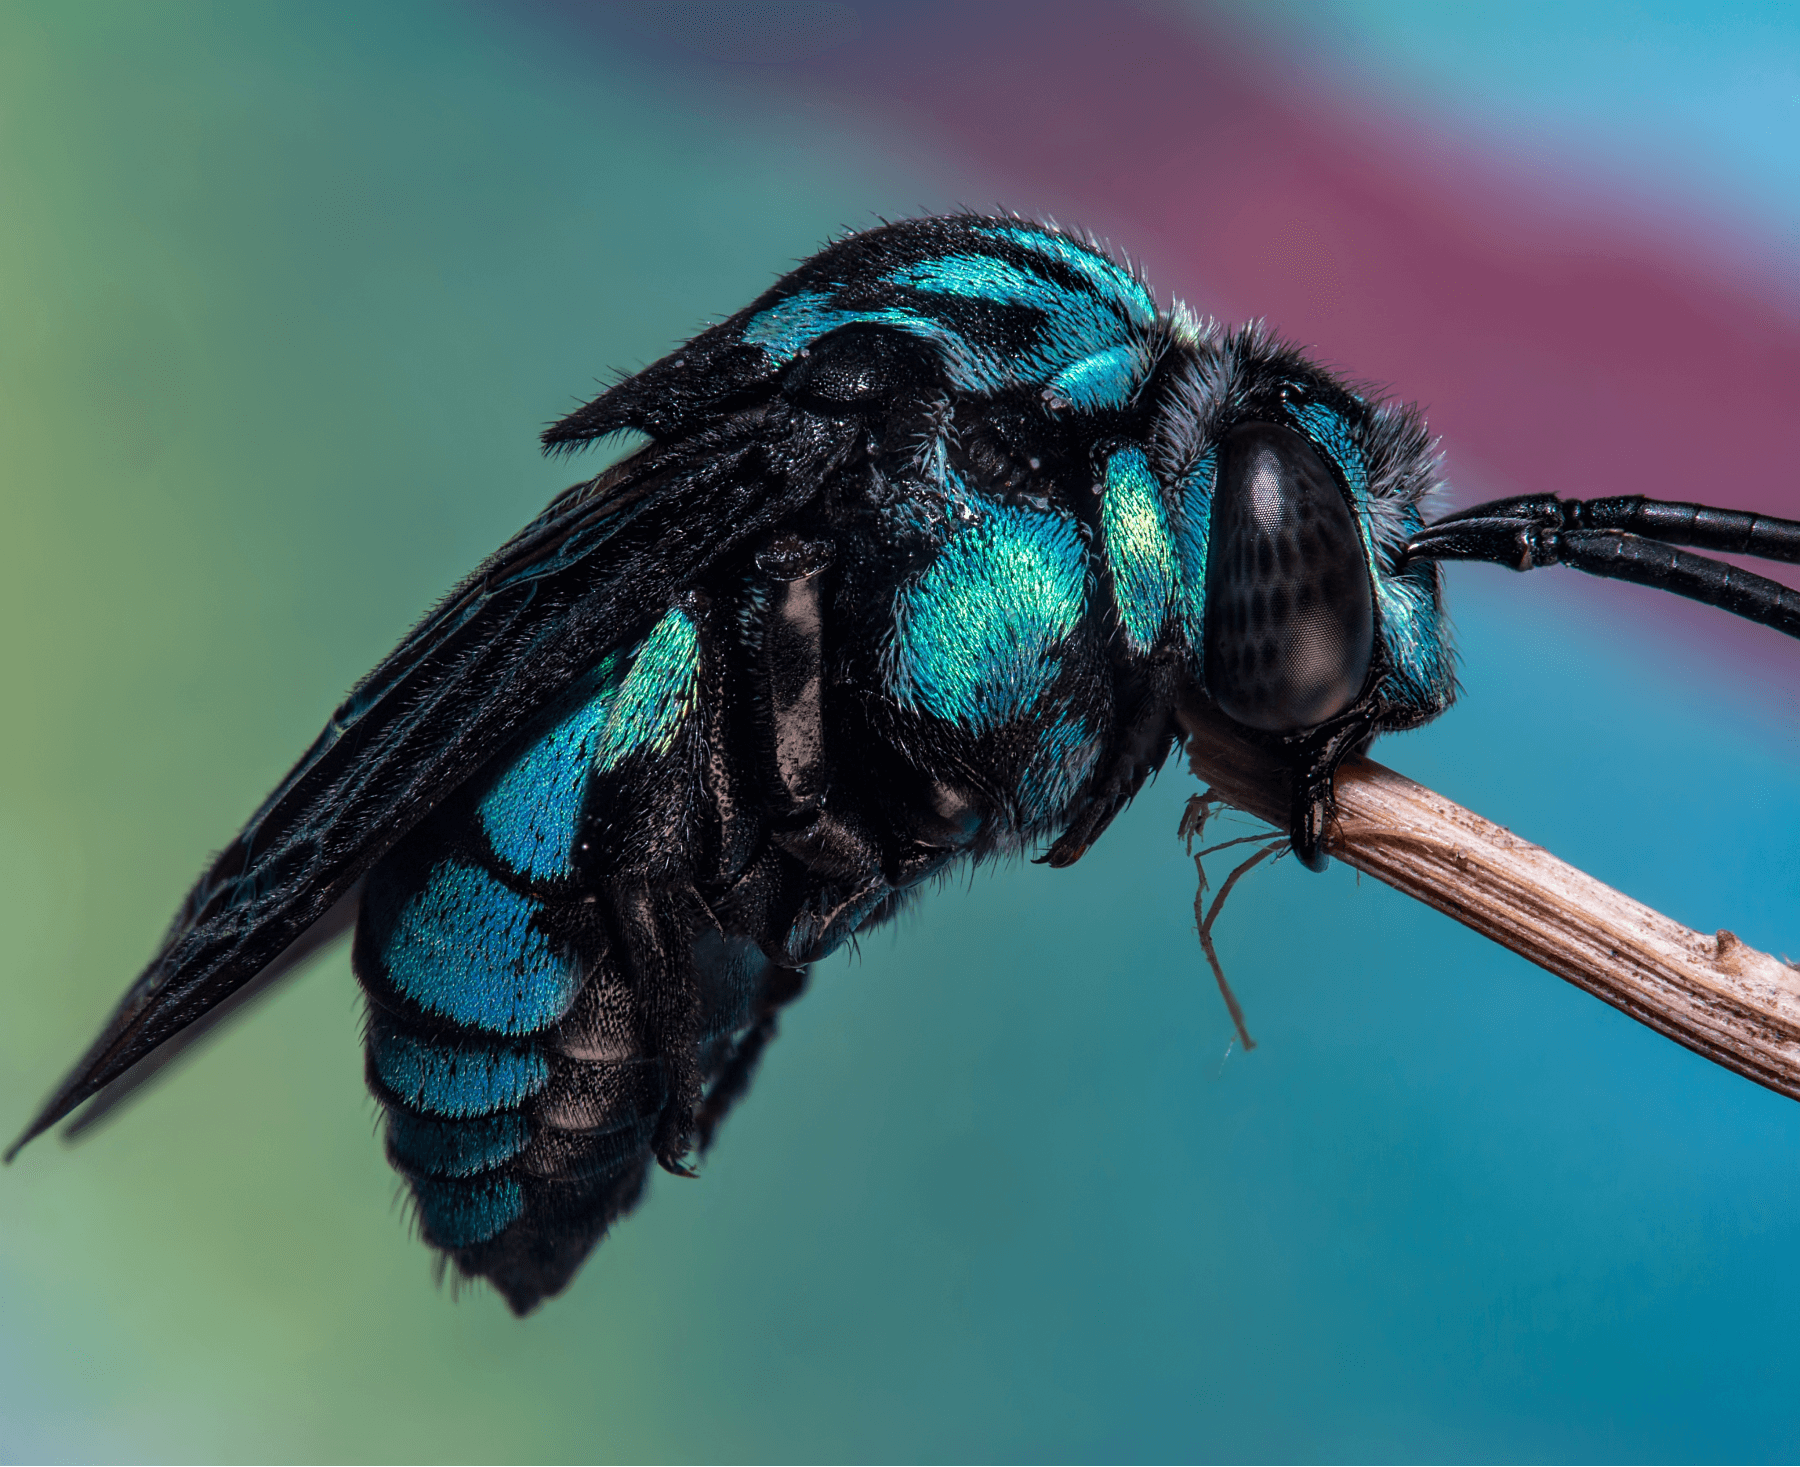 Неоновая пчела-кукушка Thyreus nitidulus. Фото: commons.wikimedia.org